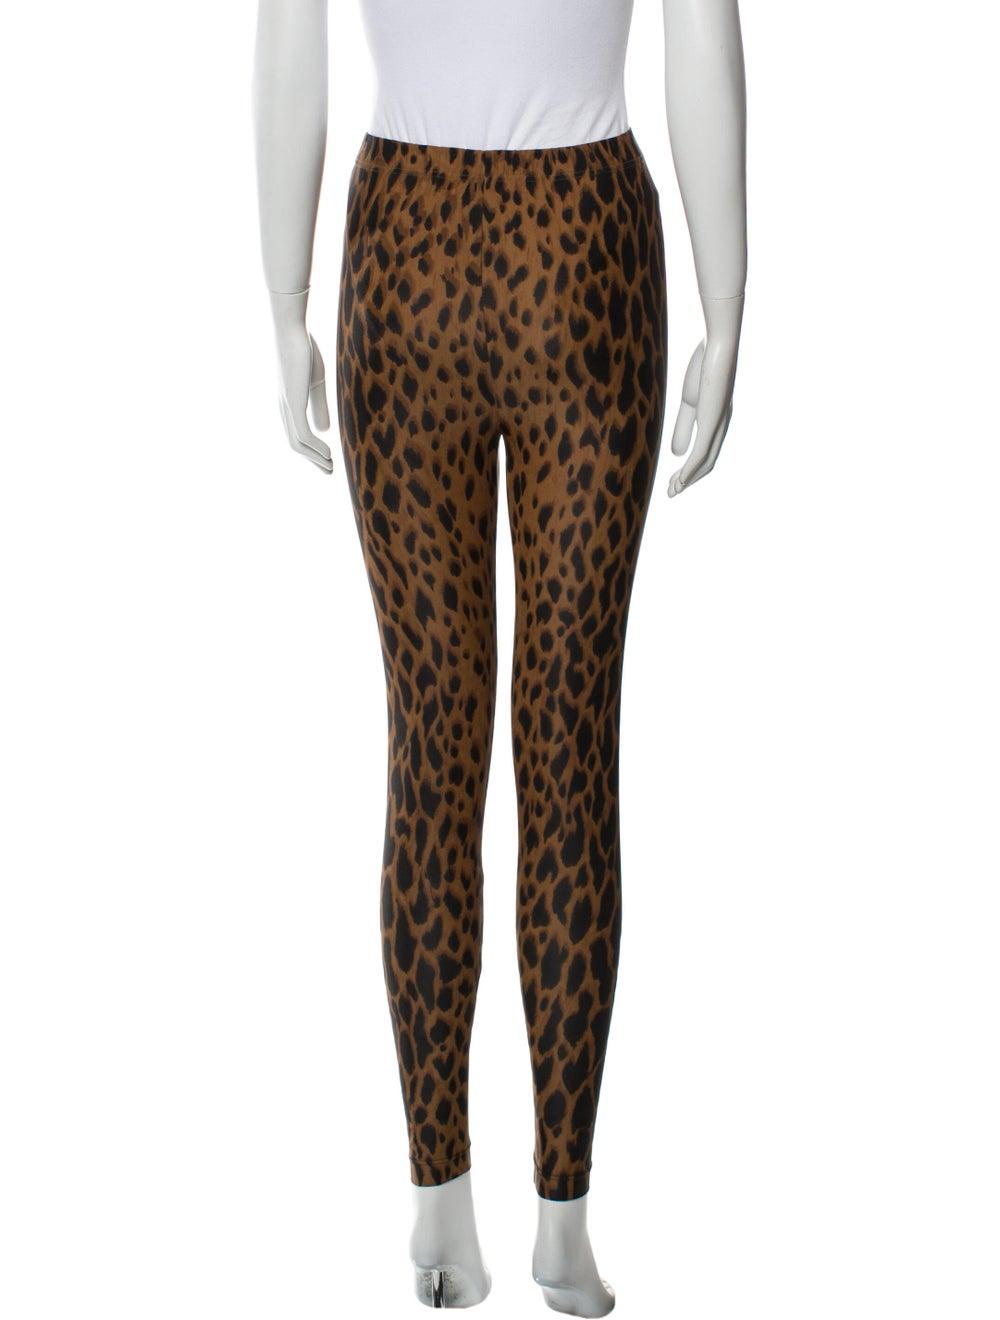 Gianni Versace Vintage Skinny Leg Pants - image 3